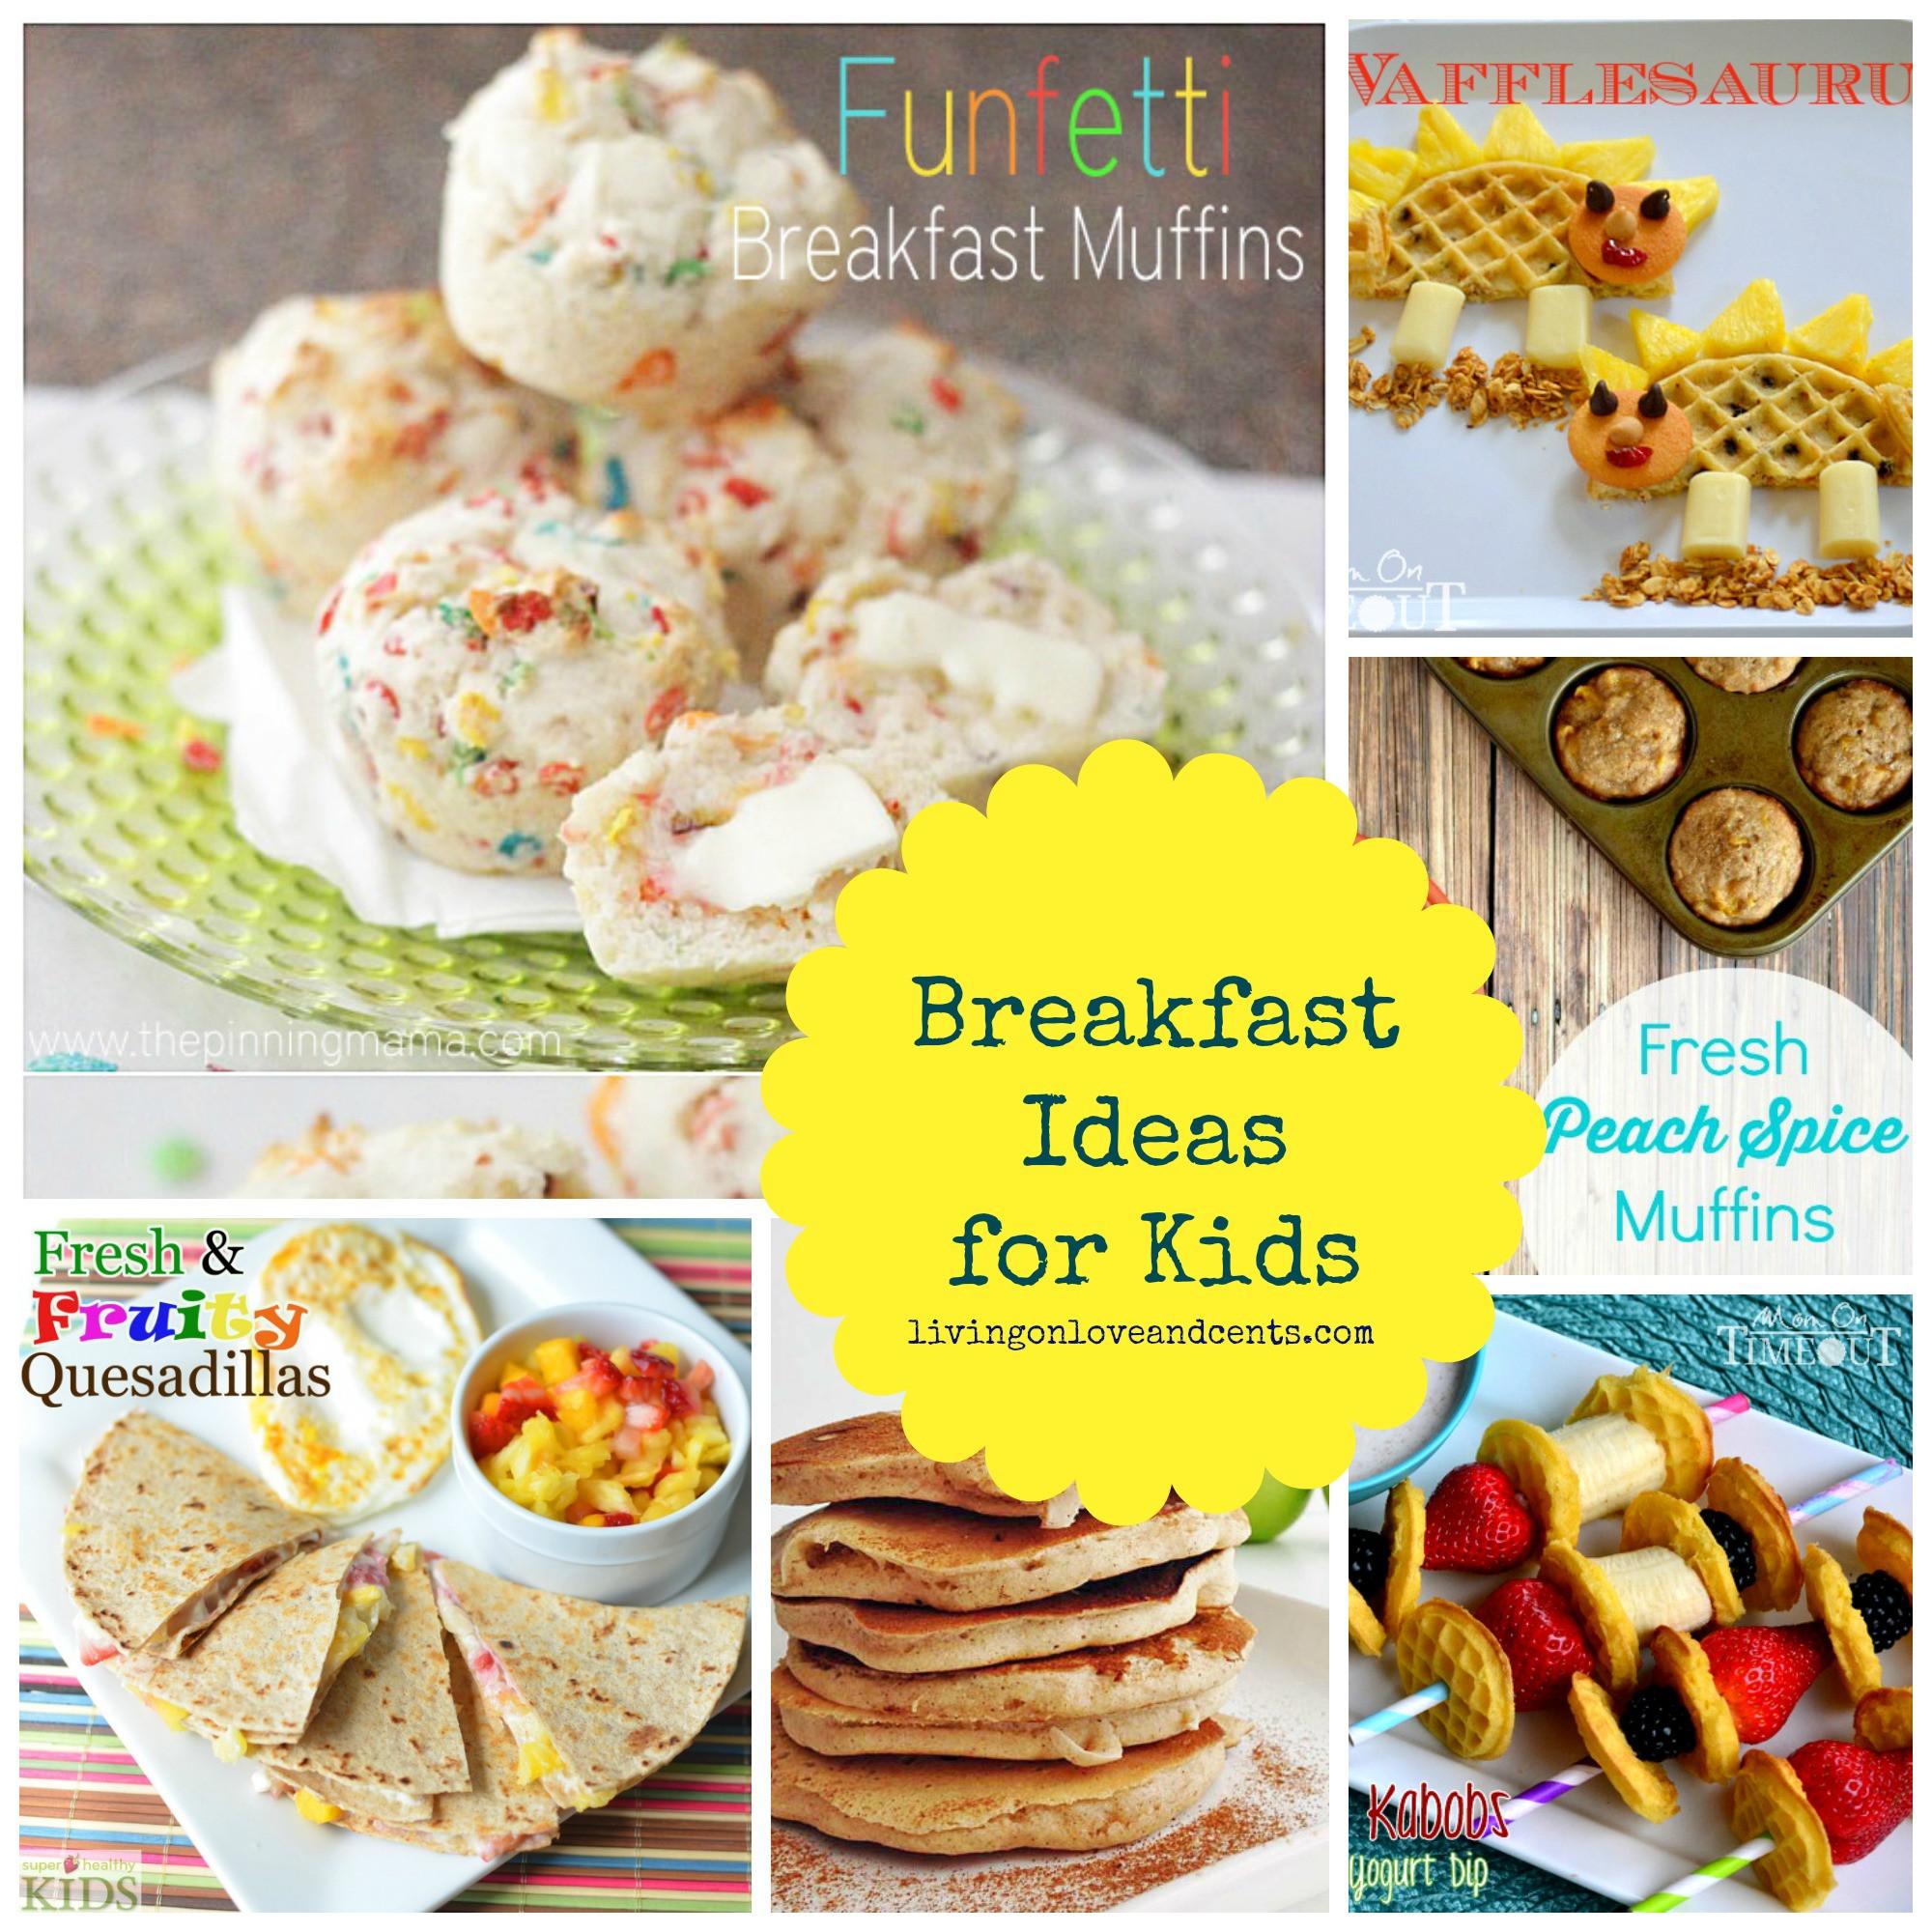 Healthy Breakfast For Kids Before School  Easy School Morning Breakfast Ideas for Kids